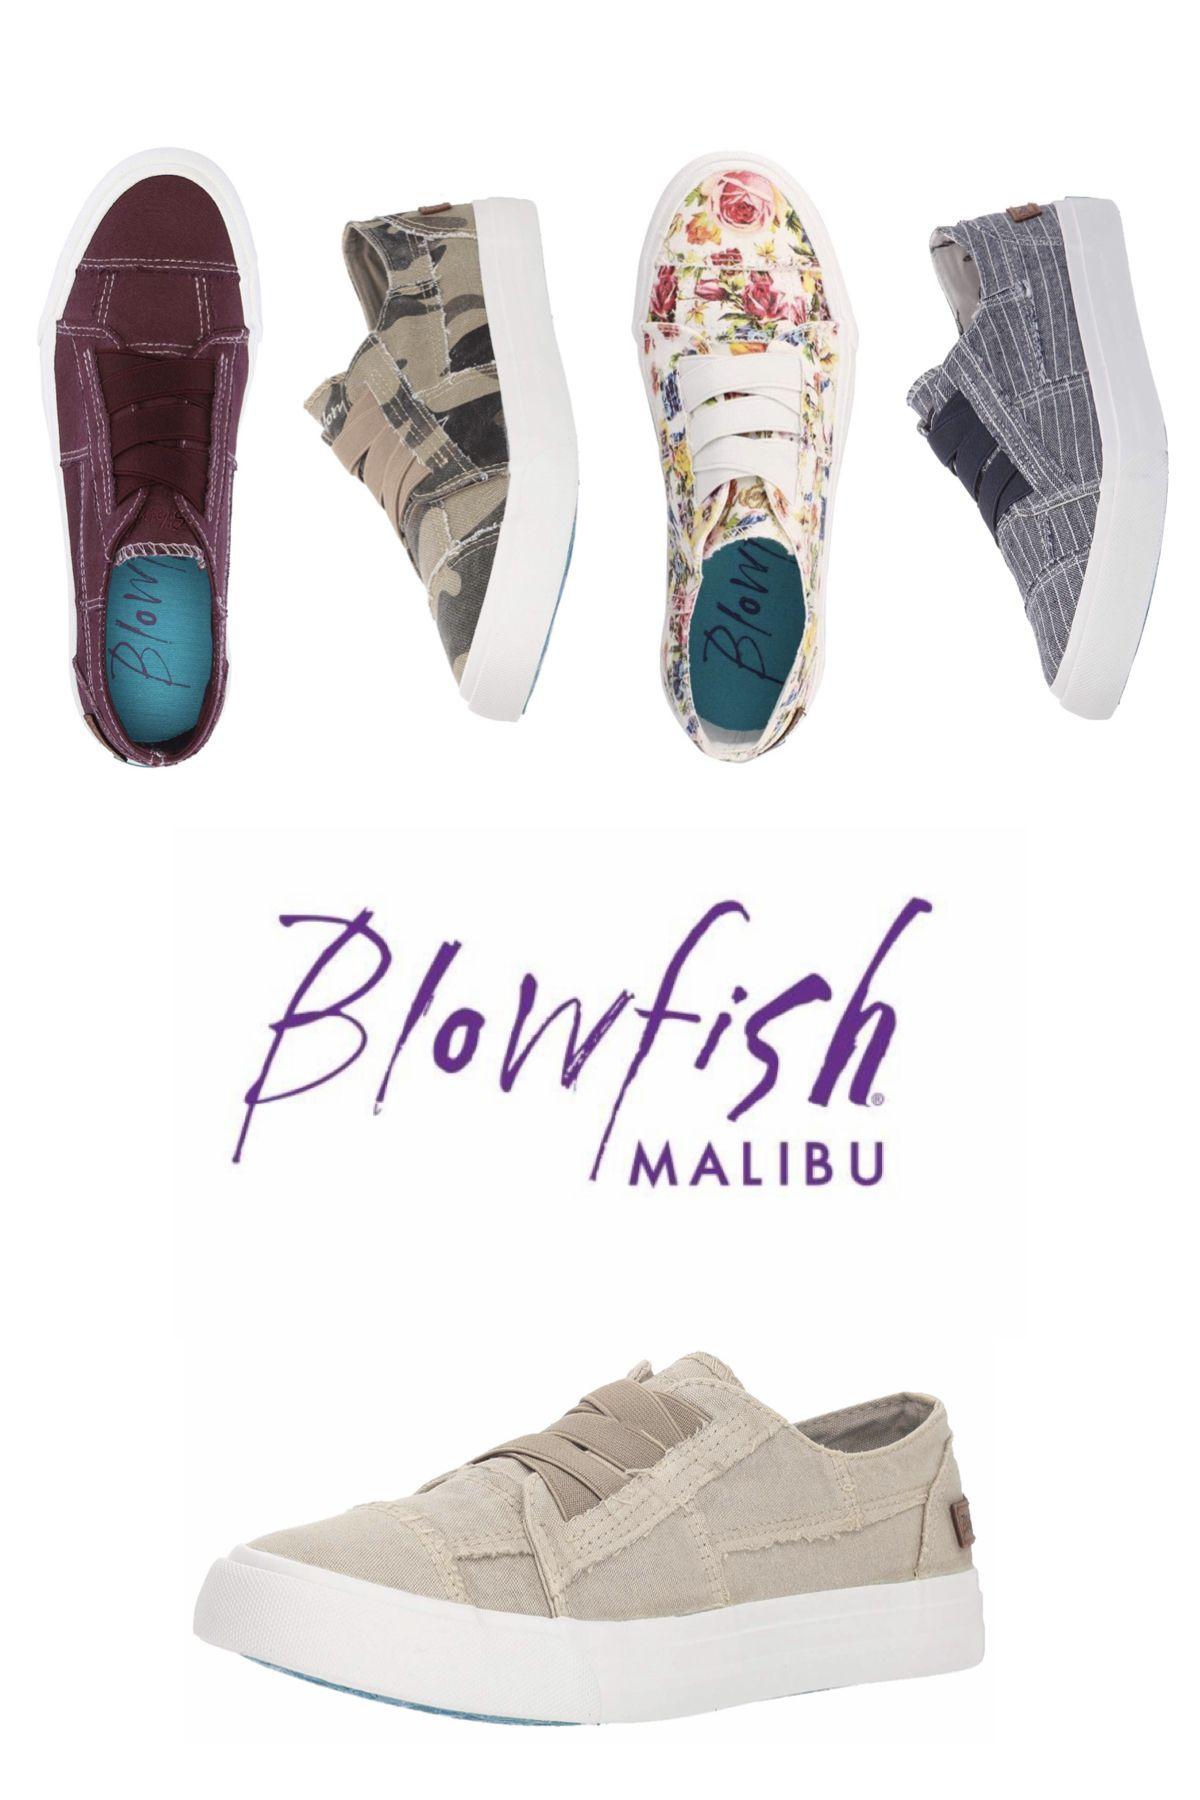 Blowfish canvas slip-on sneakers